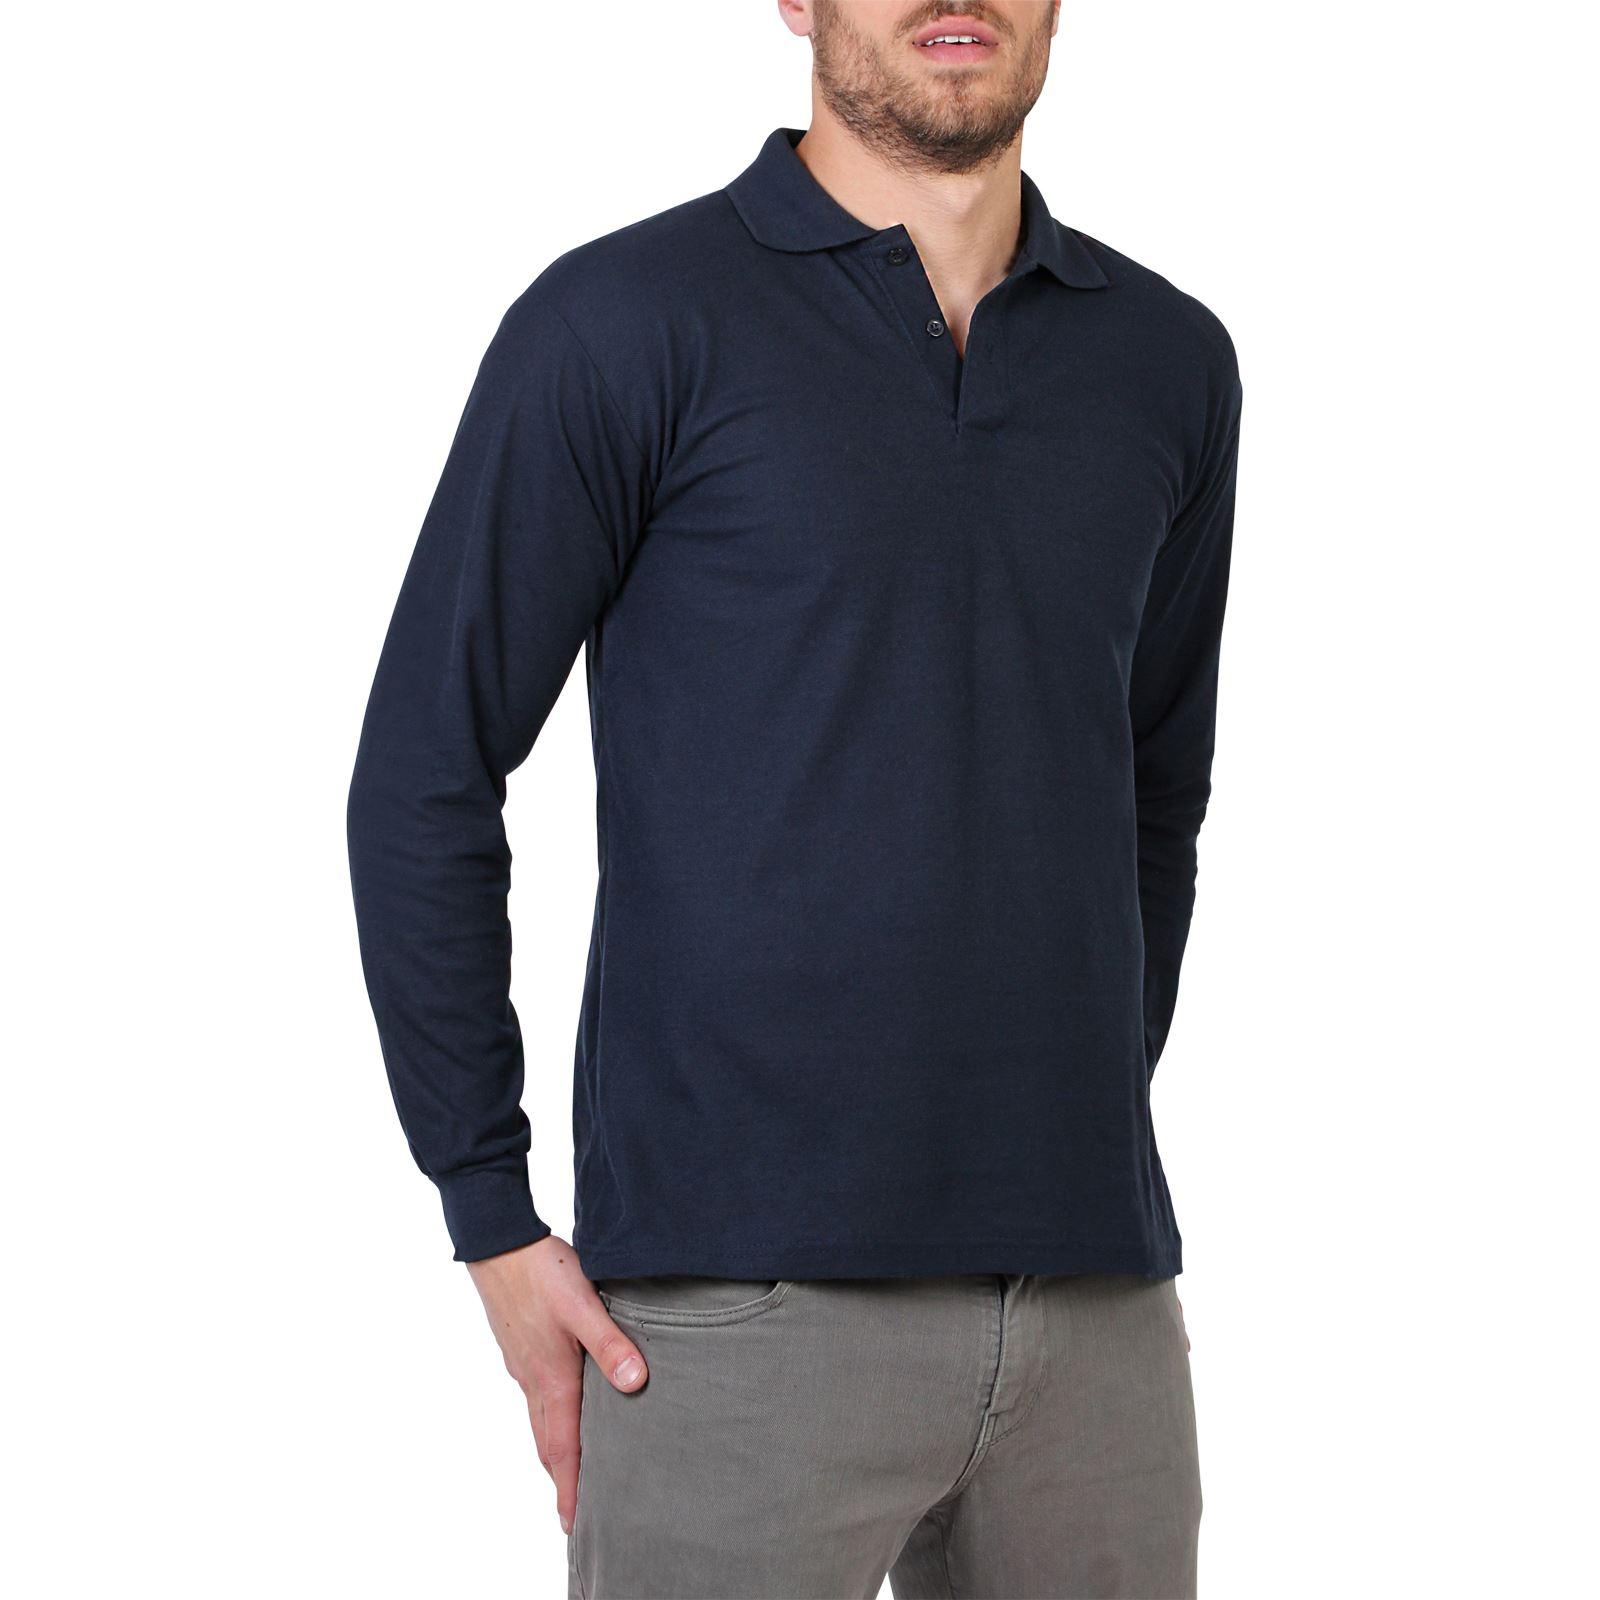 Mens casual long sleeve polo t shirt top plain regular for Xxl mens polo shirts